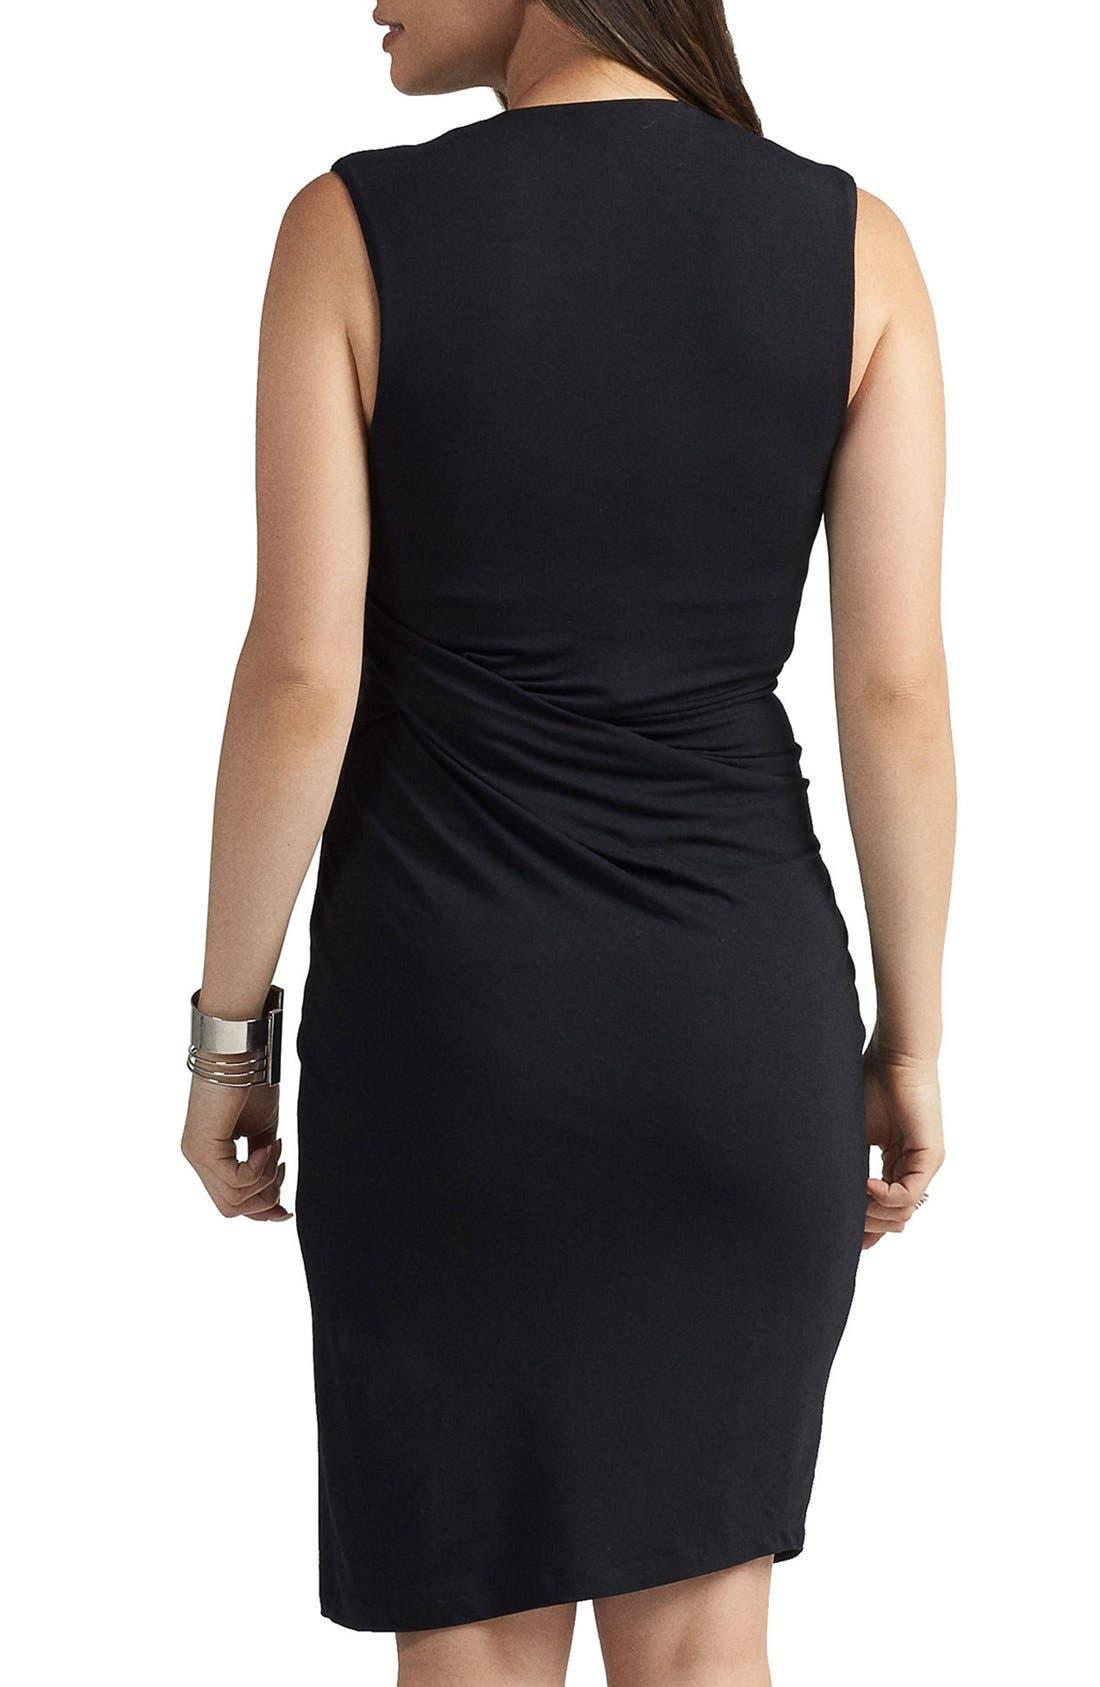 Margaux Maternity Dress,                             Alternate thumbnail 2, color,                             BLACK